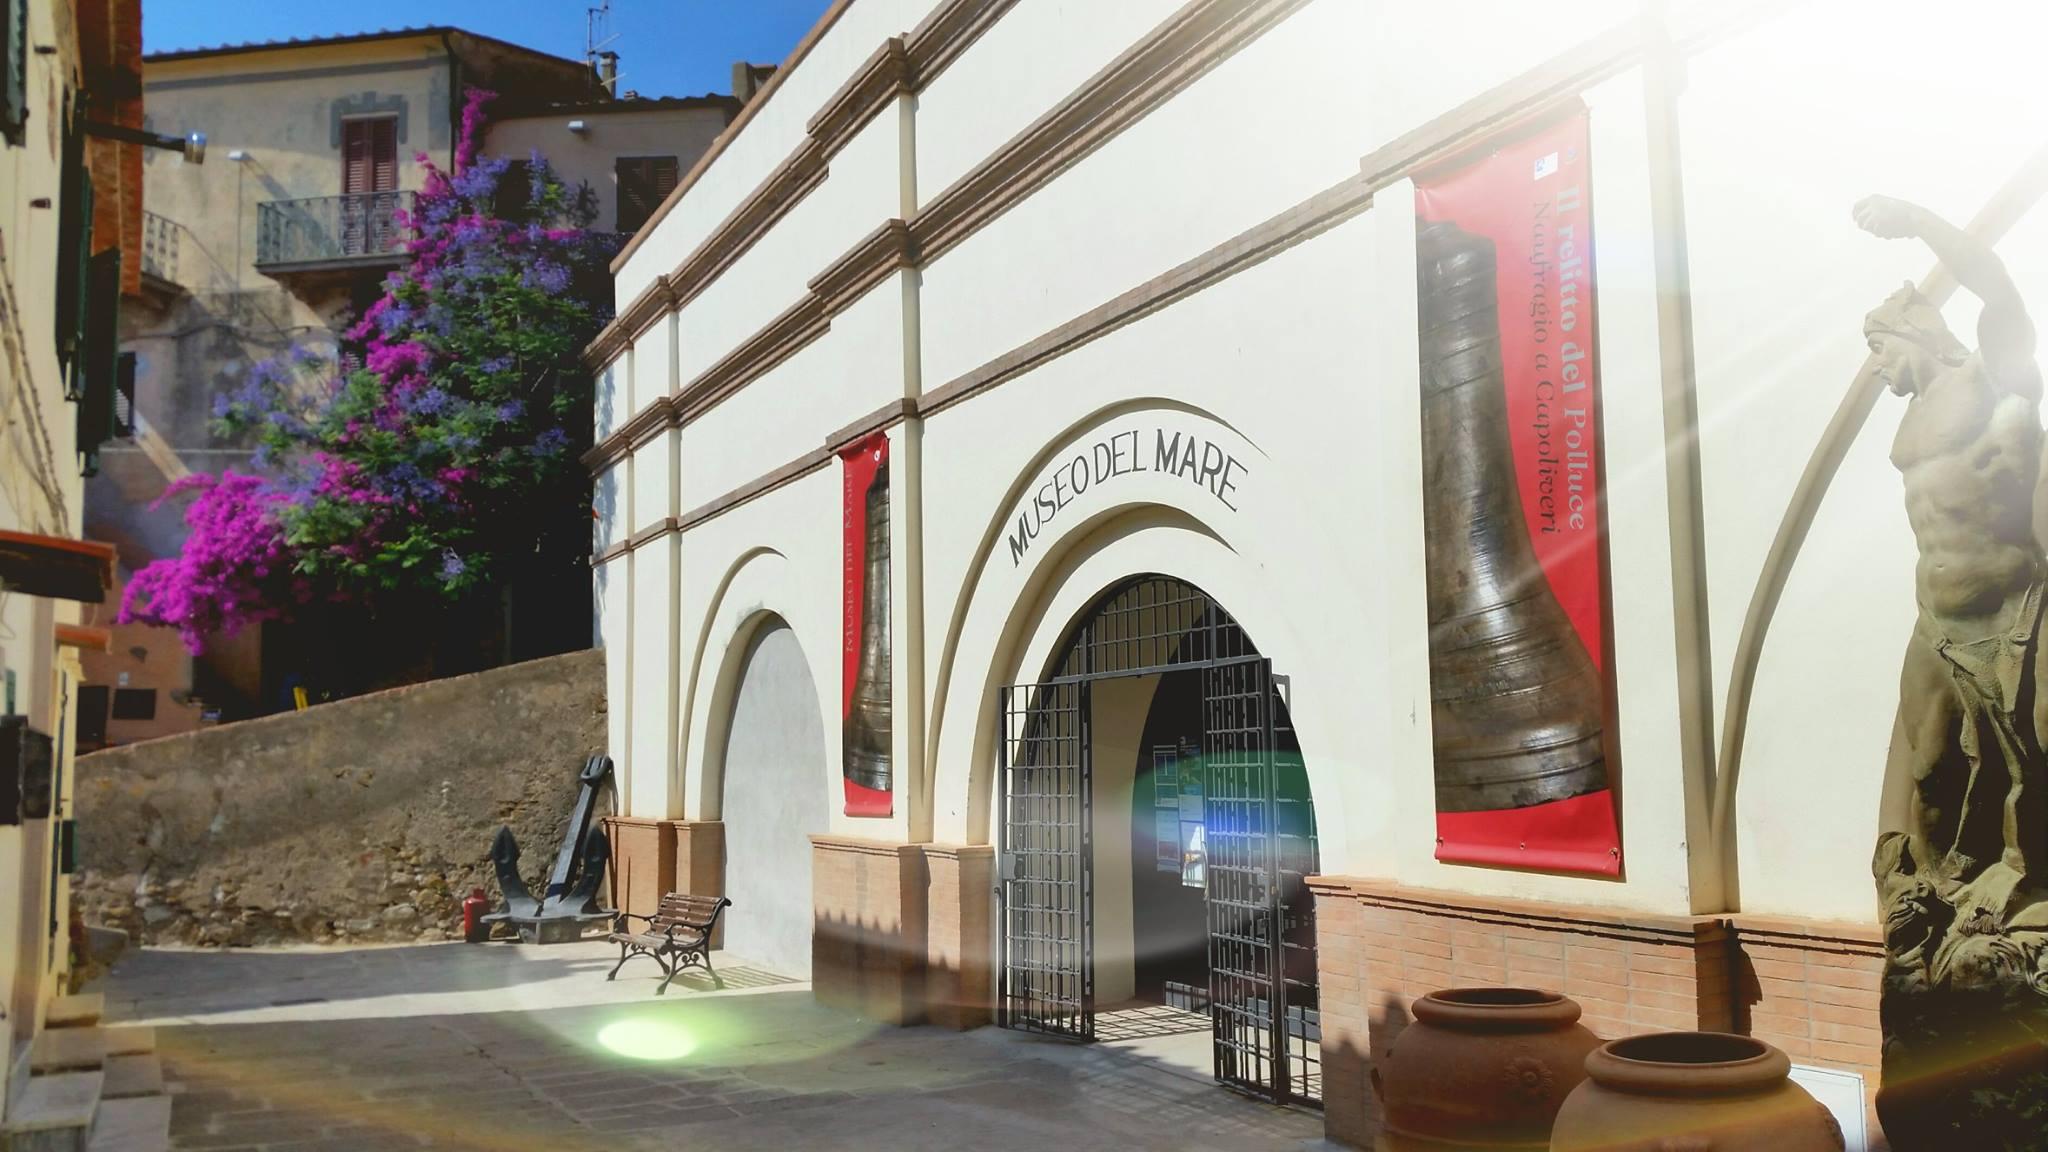 Museo Del Mare in Capoliveri Elba